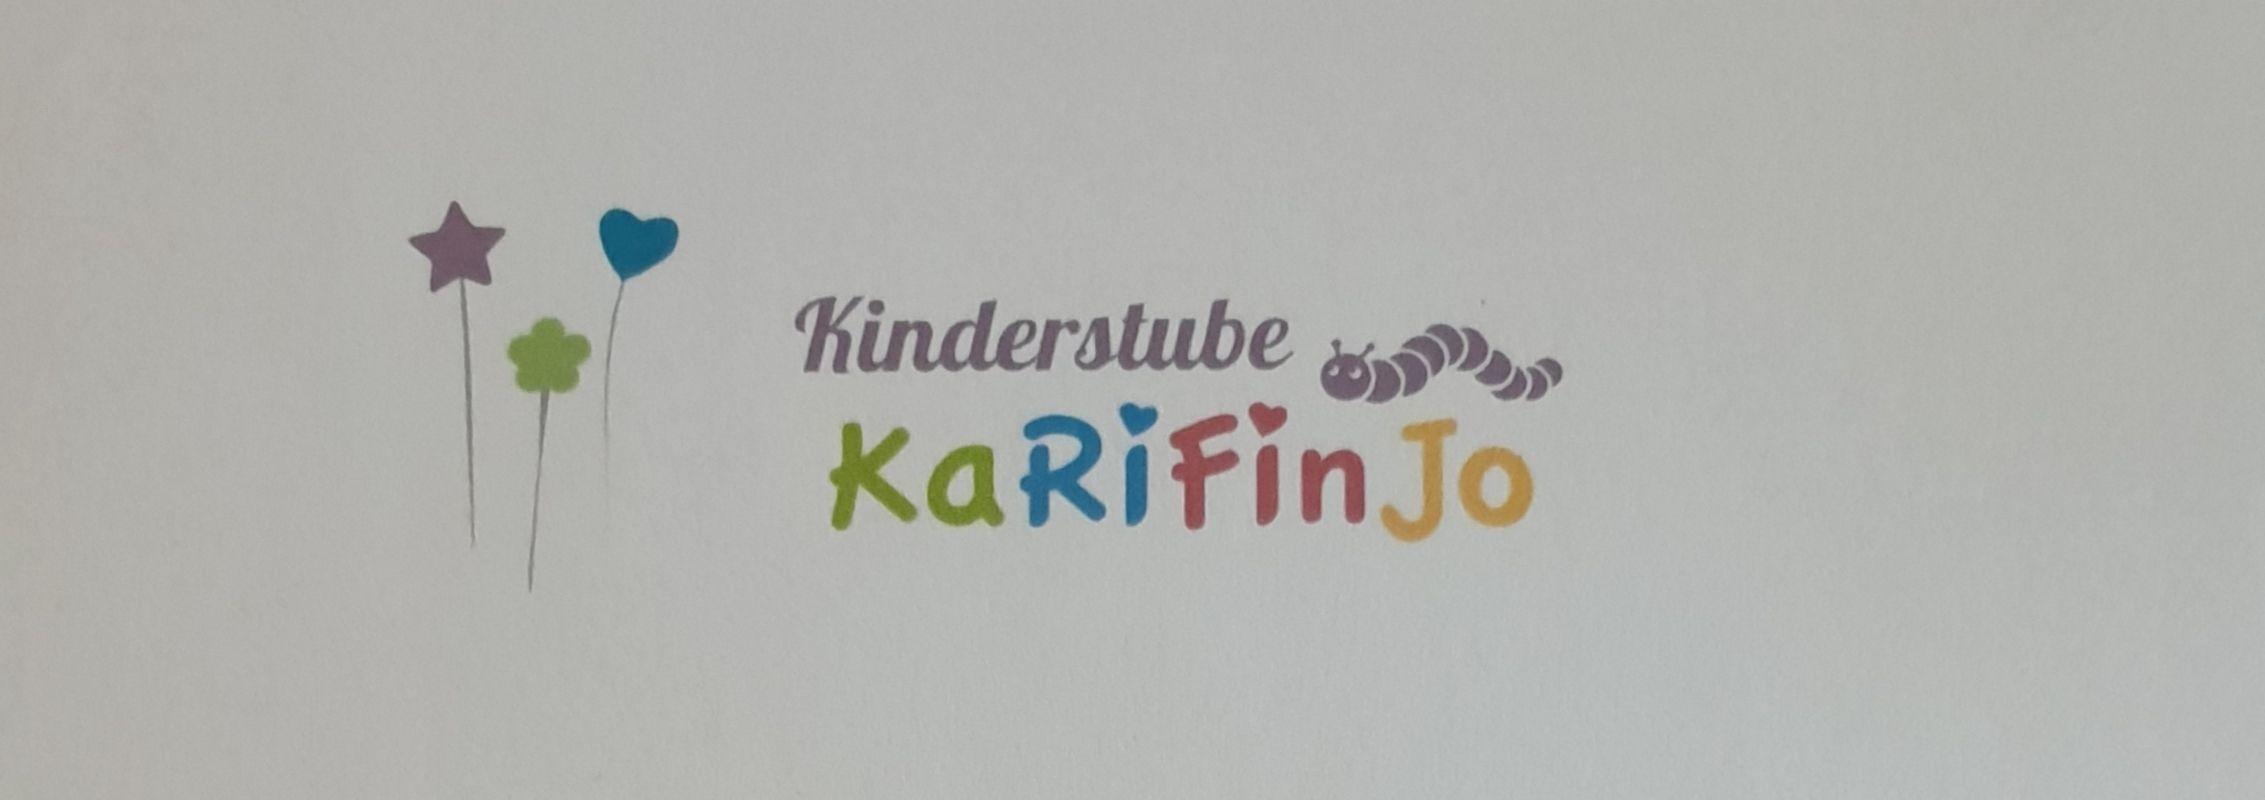 Kinderstube Karifinjo